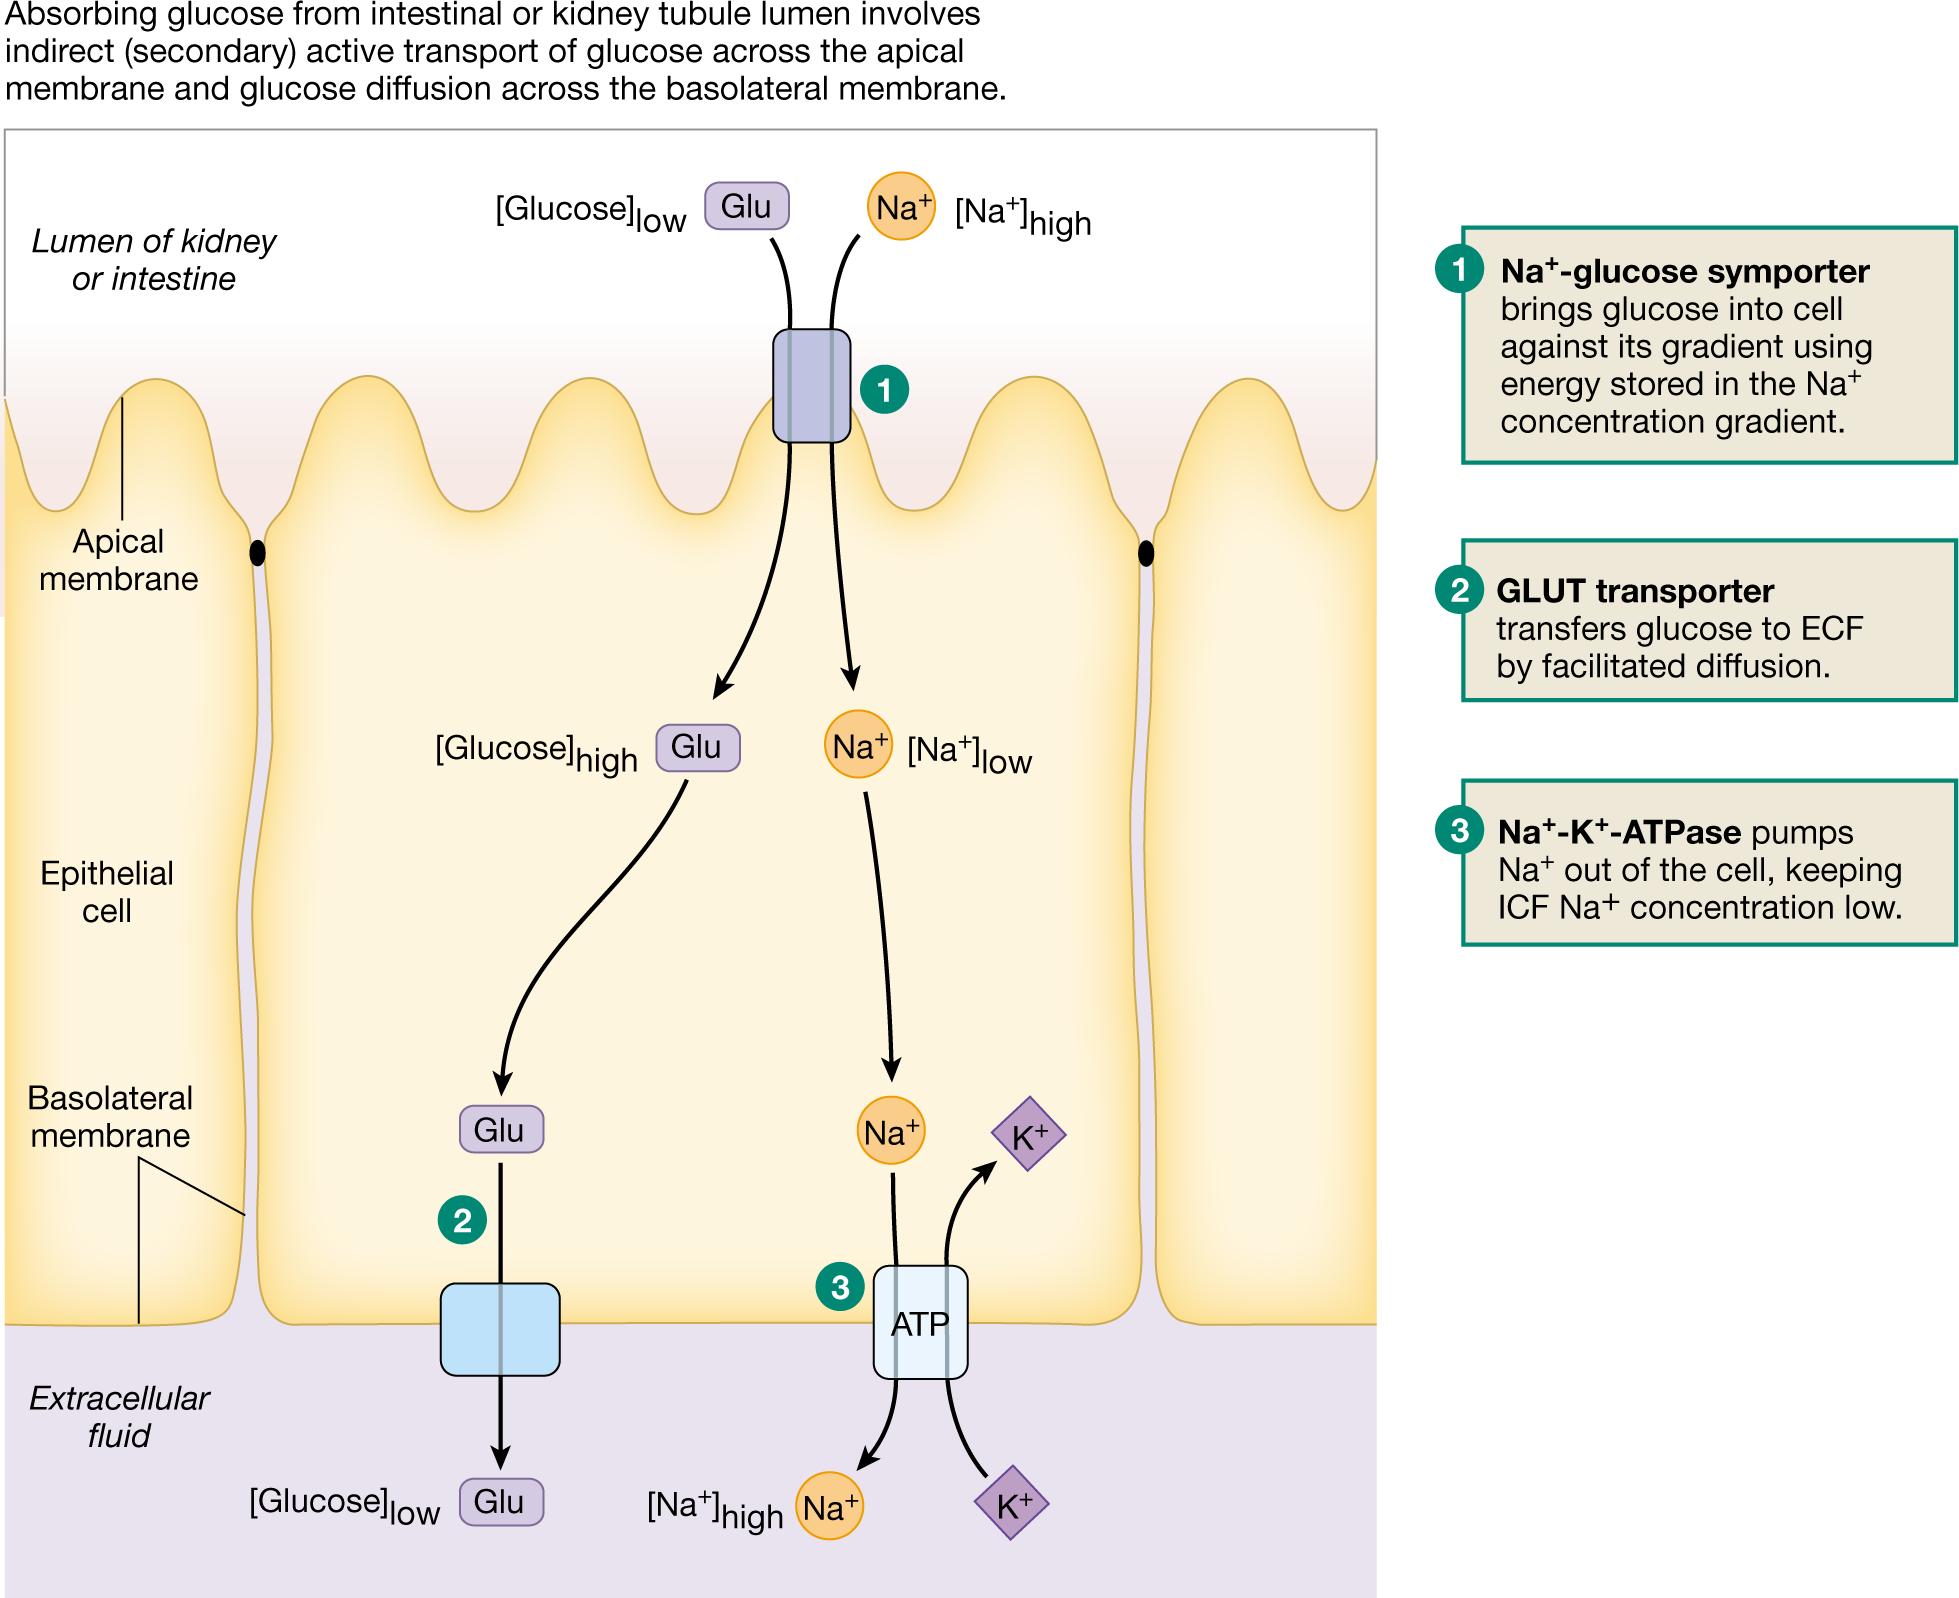 Kidney Tubule Apical Membrane